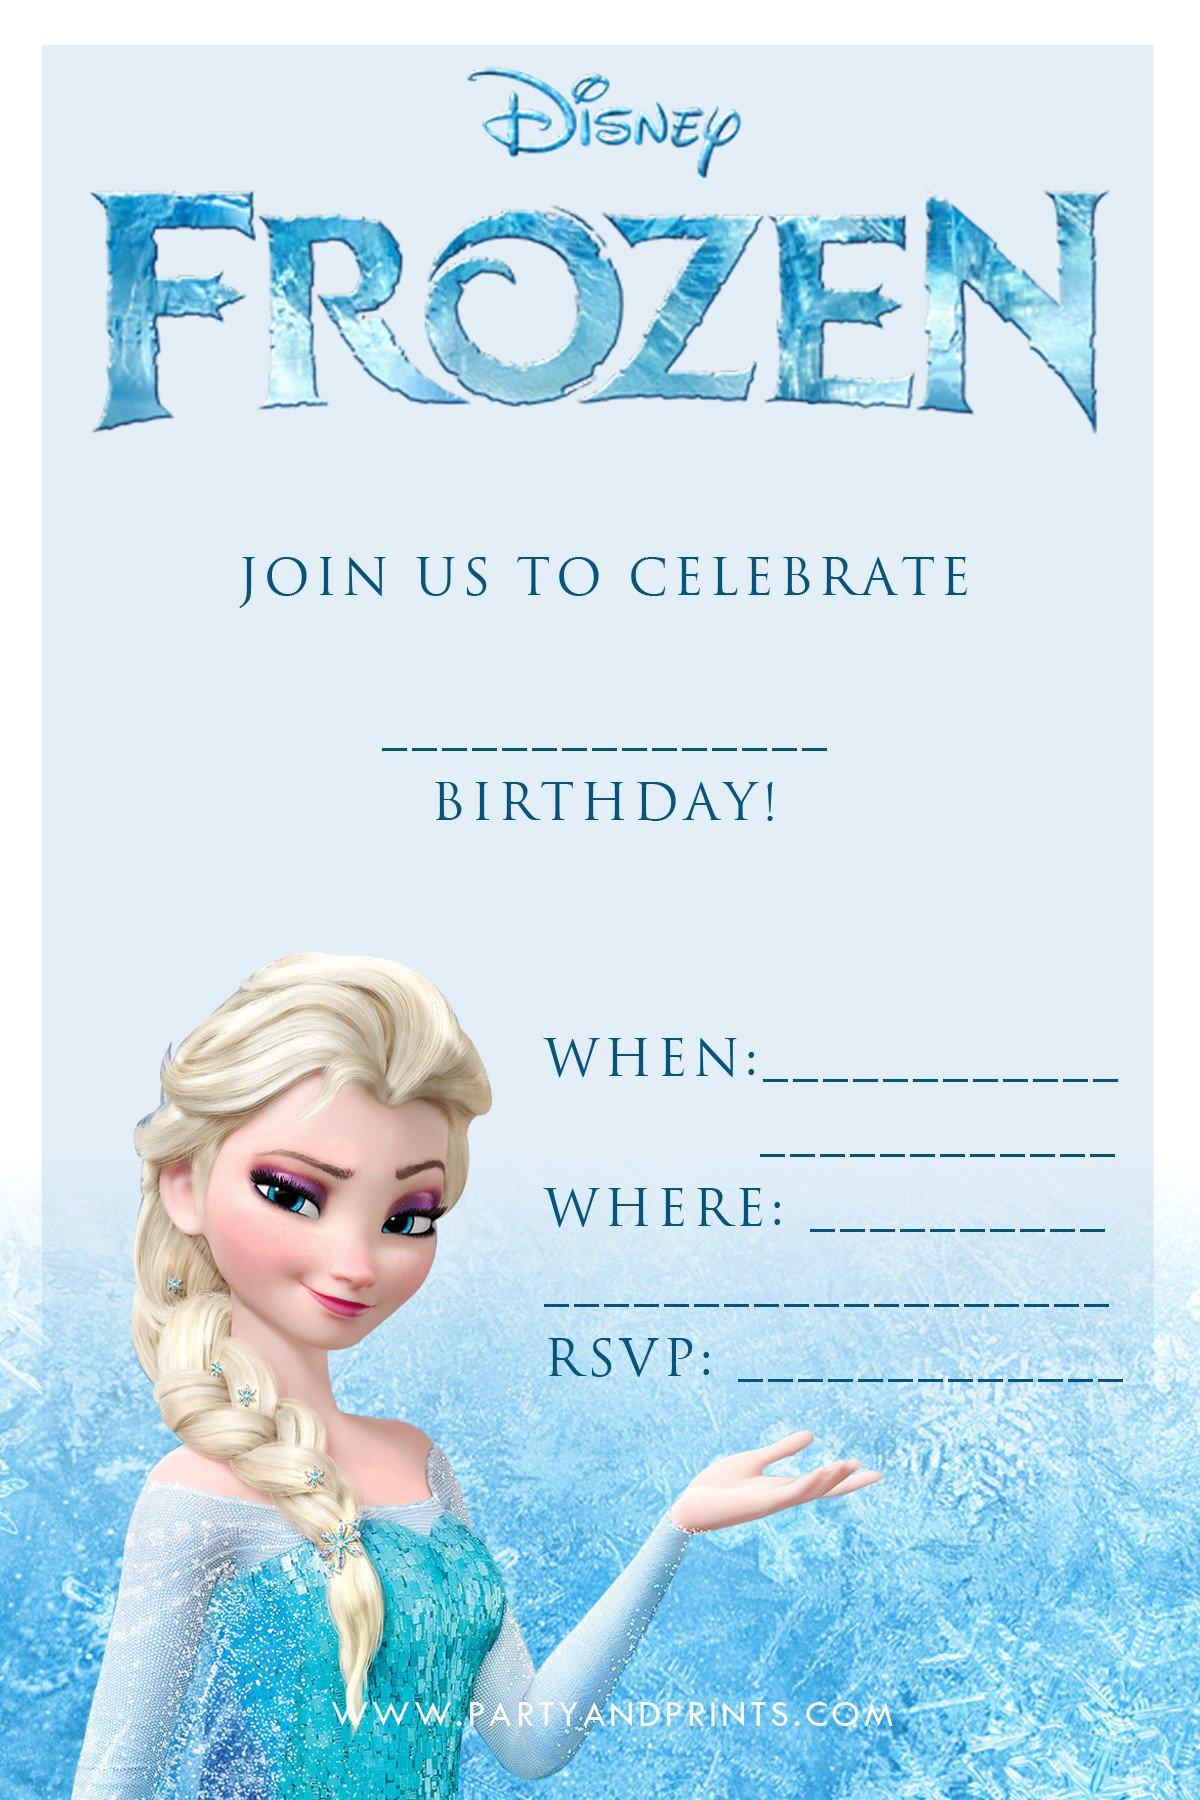 Frozen Birthday Invitations Cards 20 Frozen Birthday Party Ideas